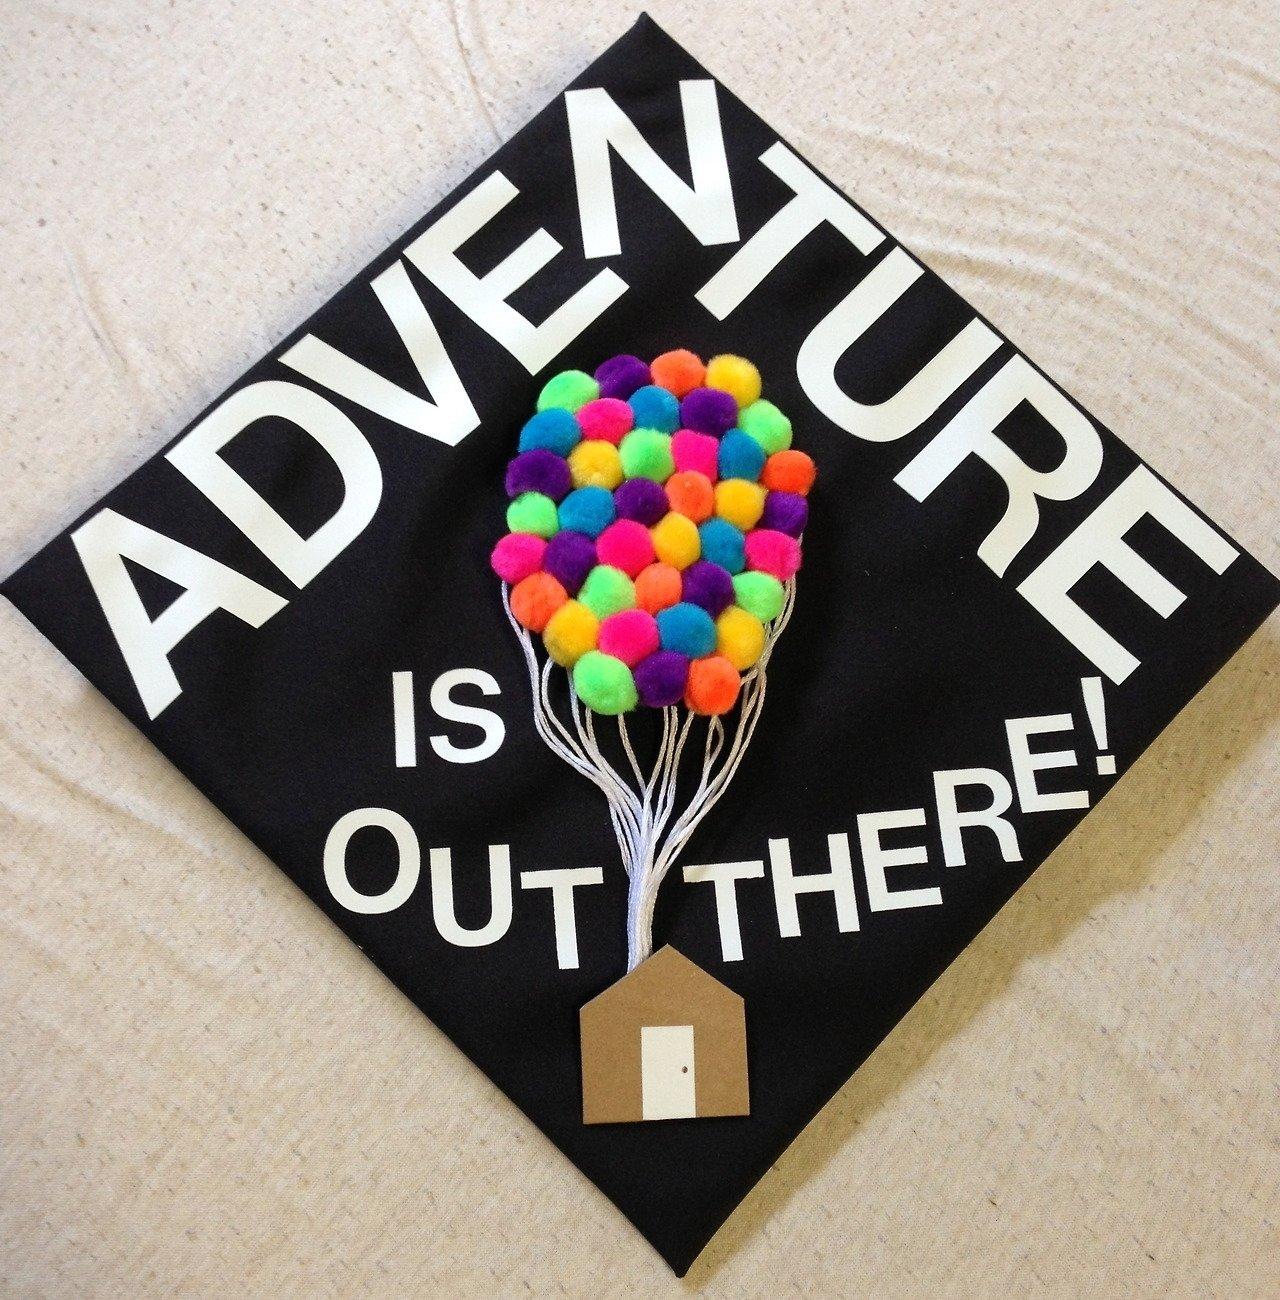 10 Lovely High School Graduation Cap Decoration Ideas disney pixar graduation caps diy cap decoration ideas for graduates 1 2020